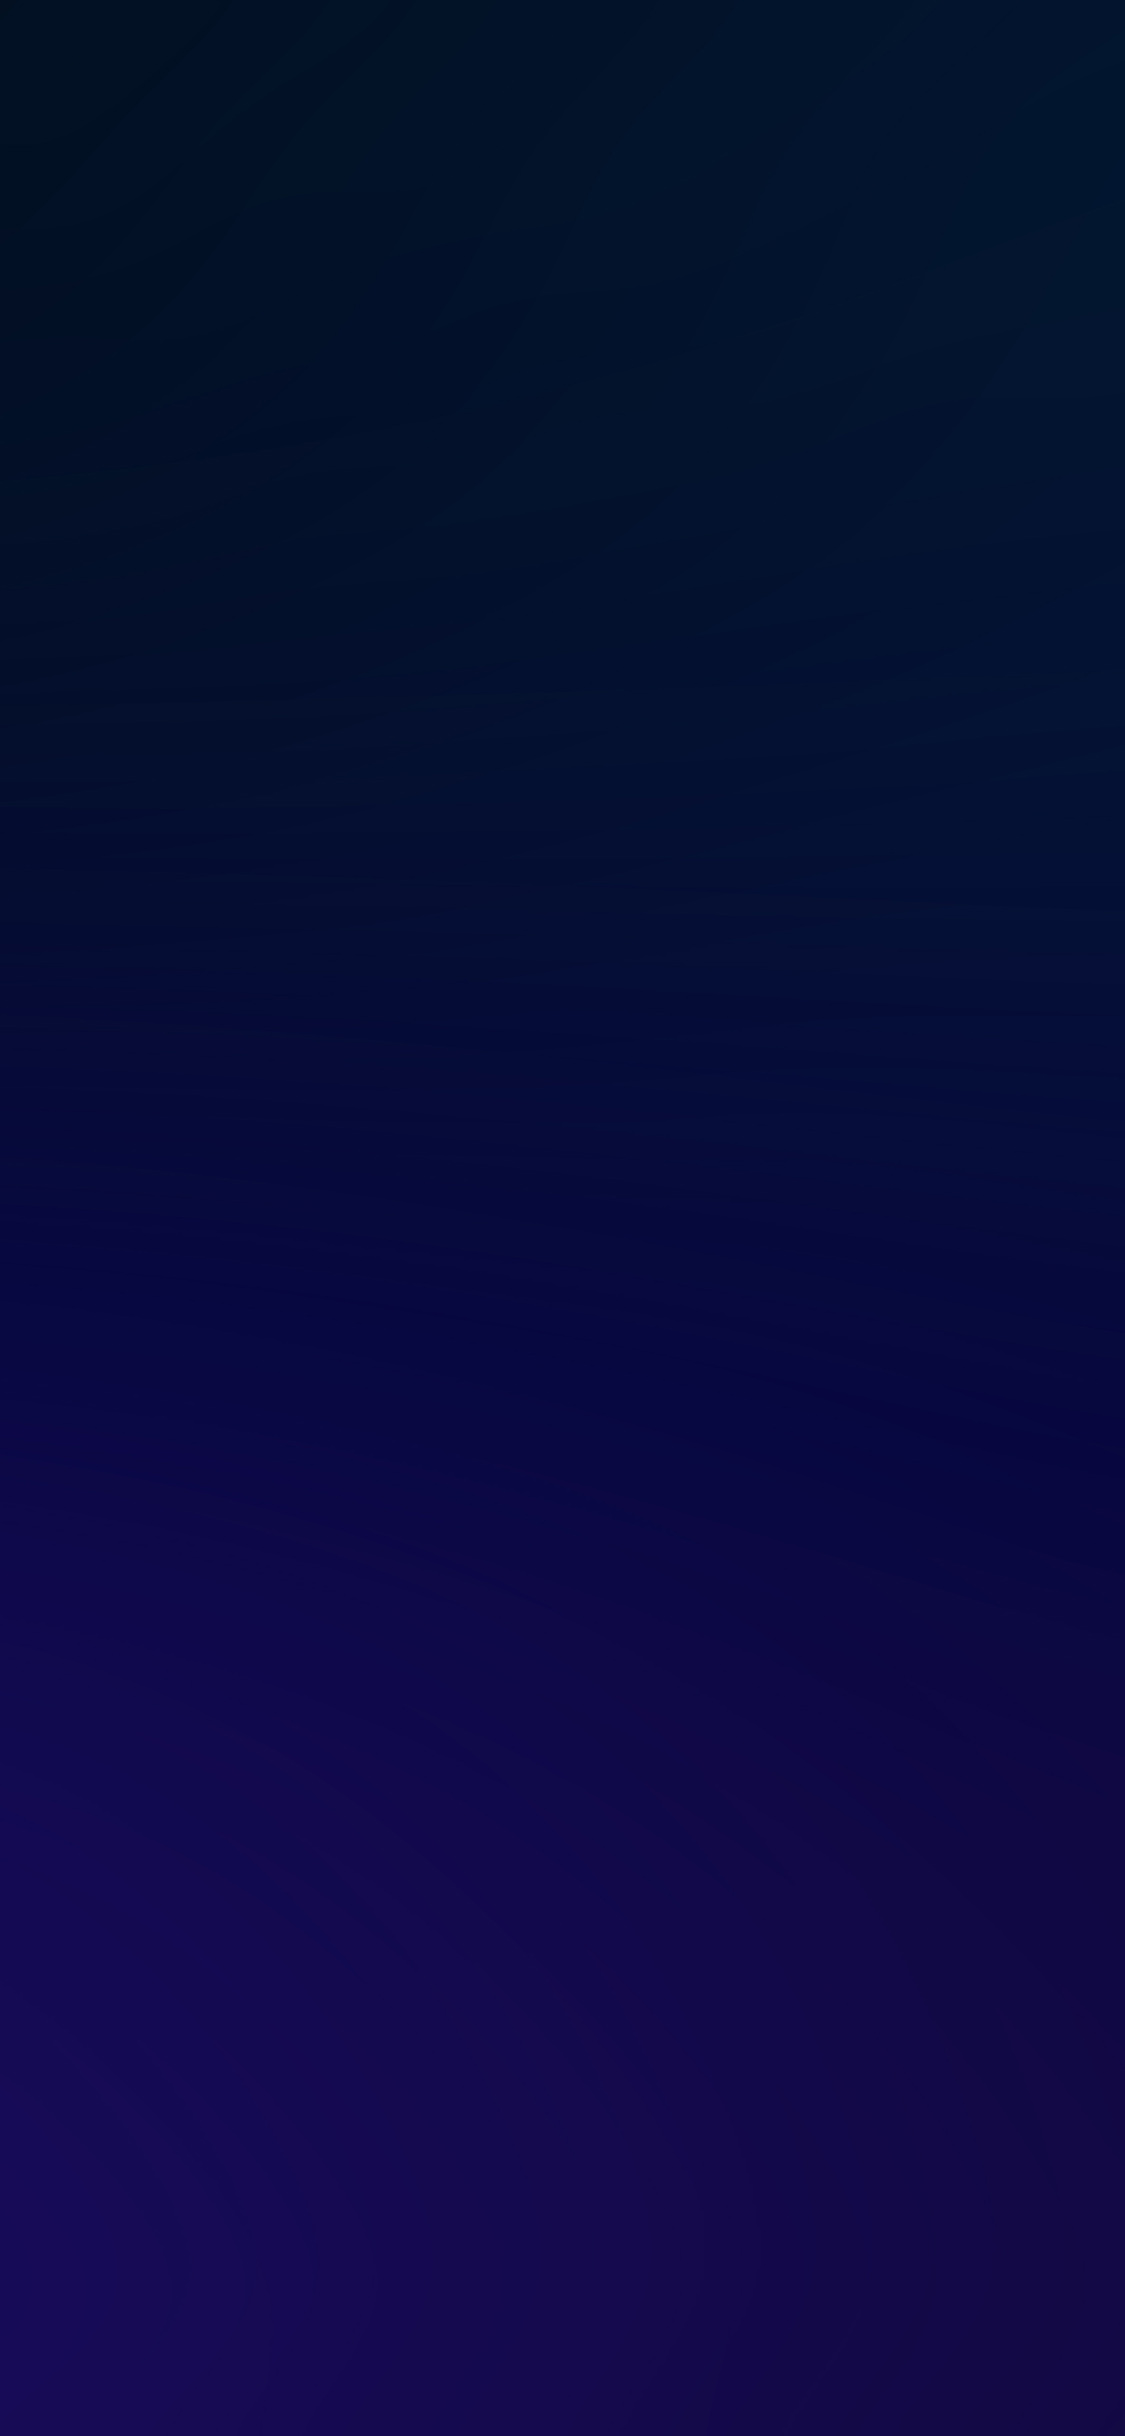 Iphonexpapers Com Iphone X Wallpaper Sk62 Dark Blue Blur Gradation